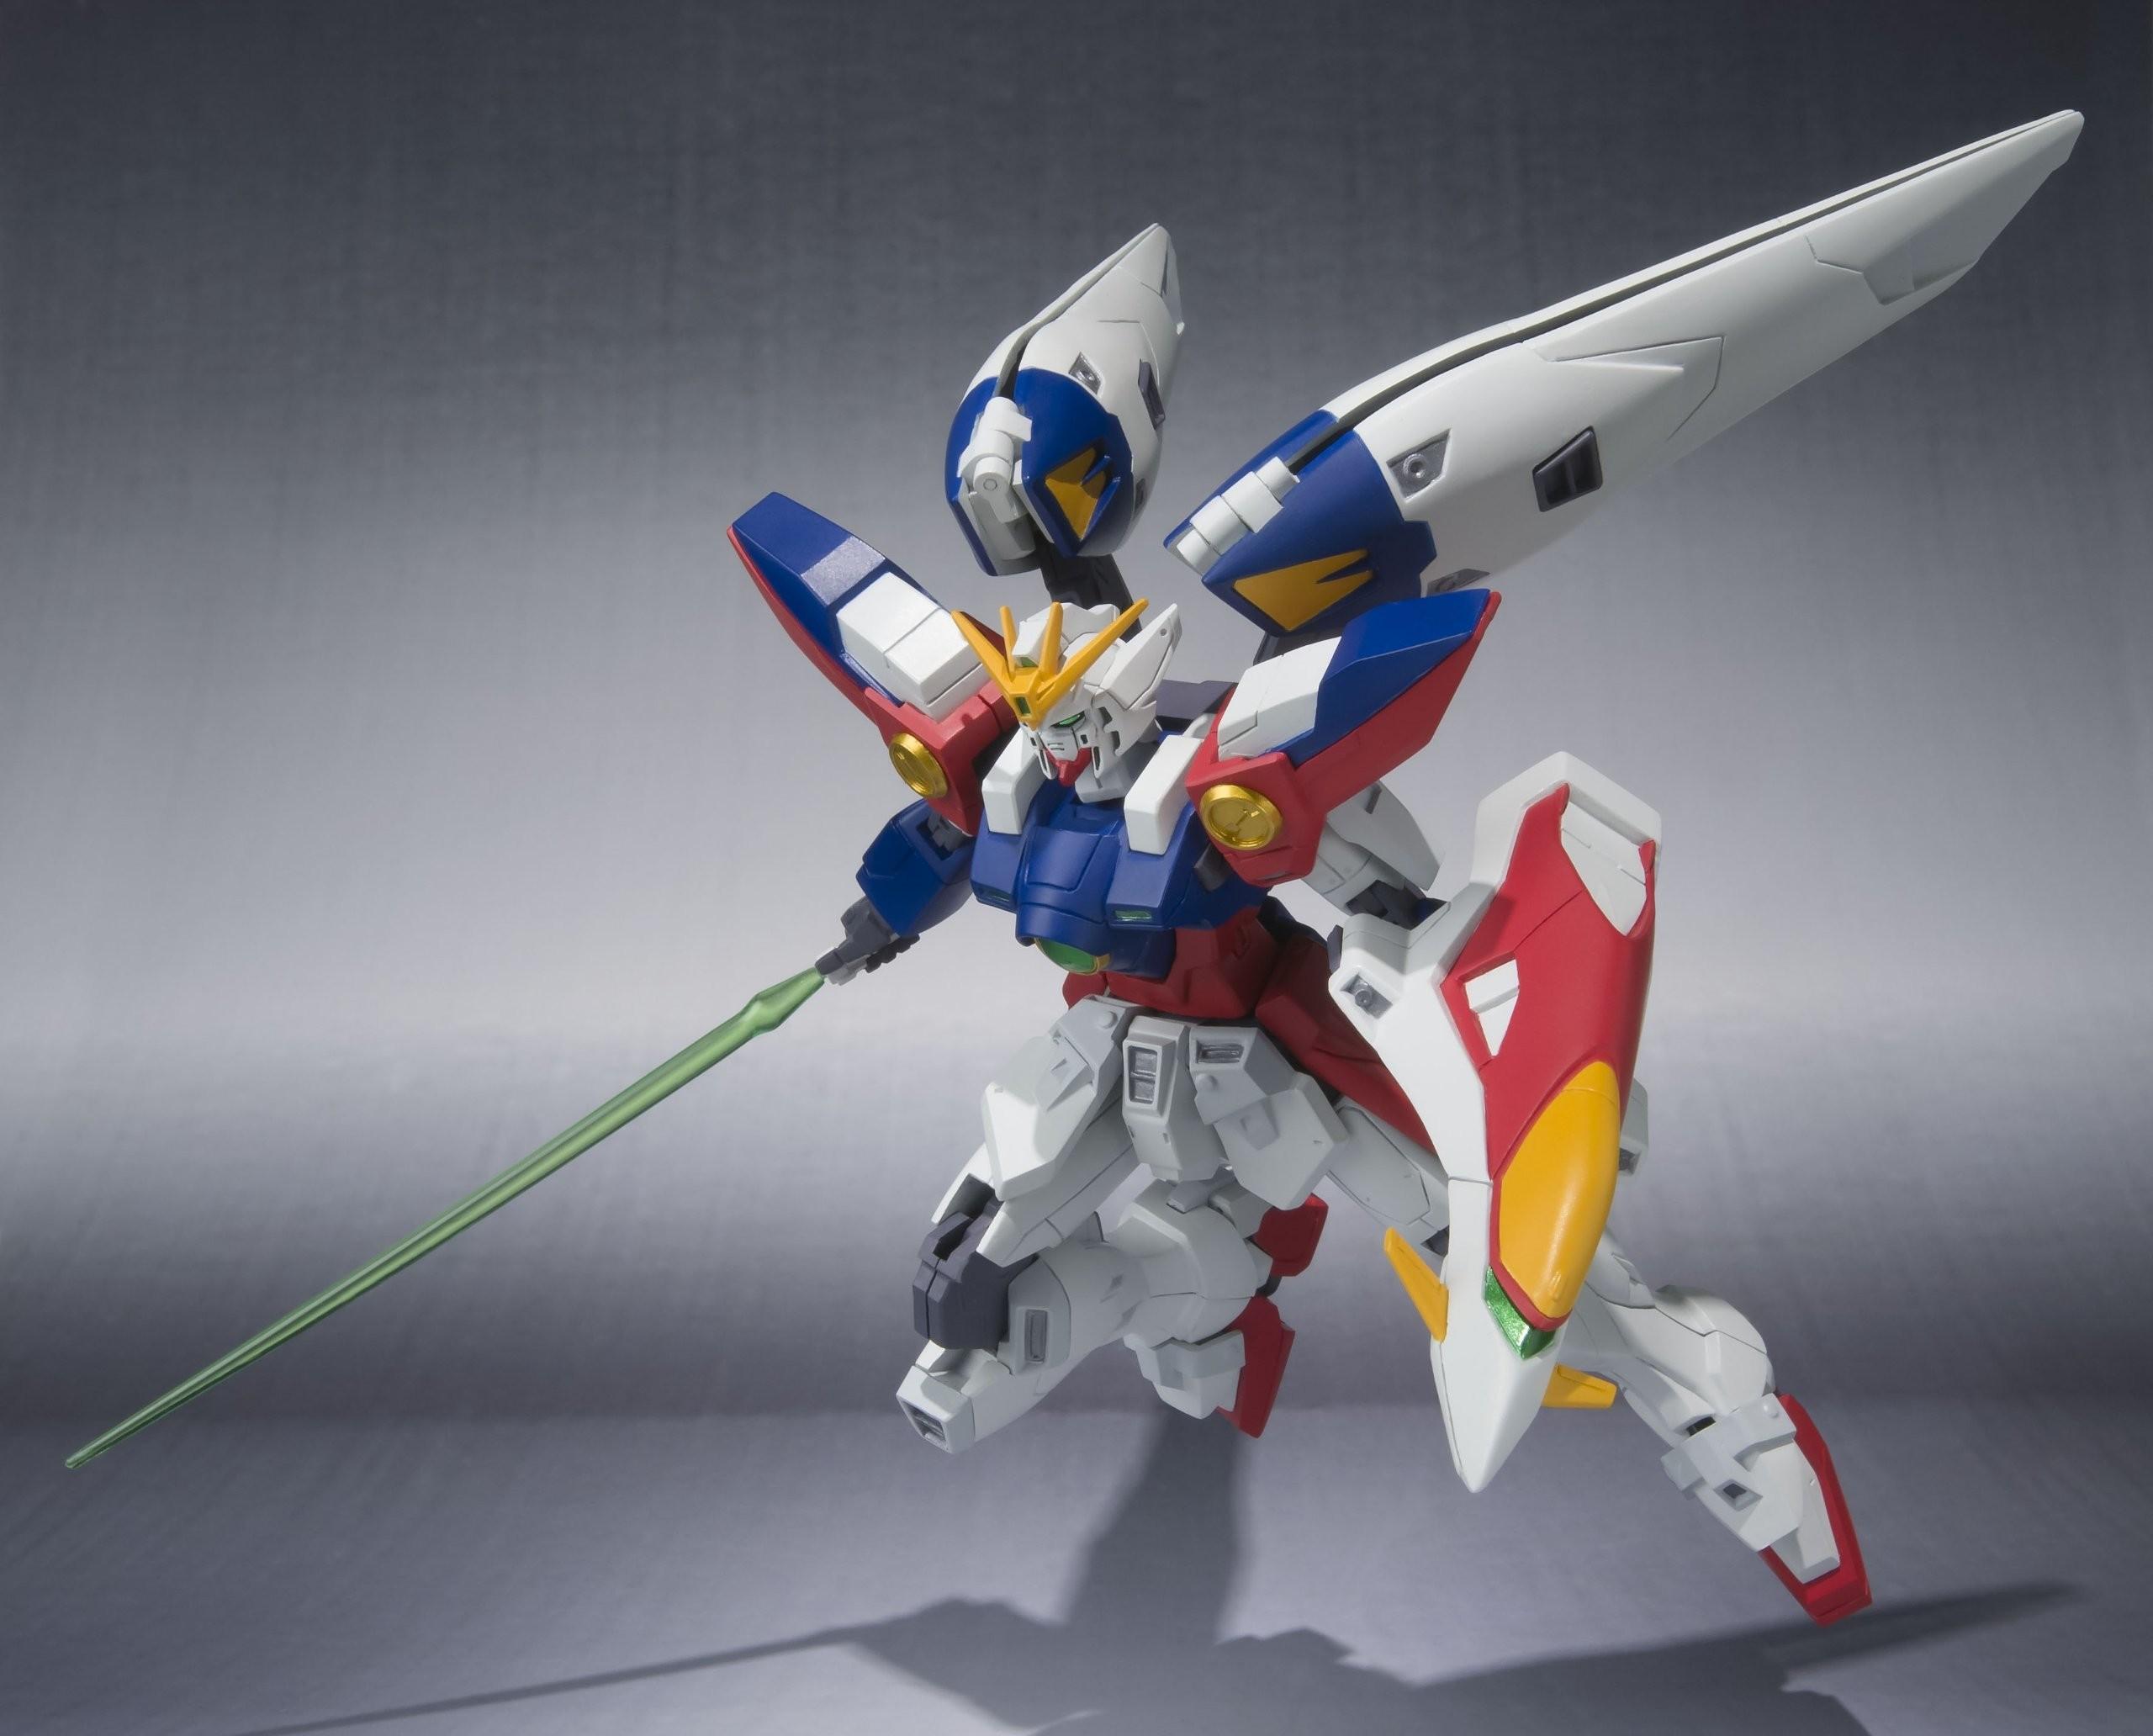 … Wing Gundam Zero: Official Wallpaper Size Images. ROBOT …